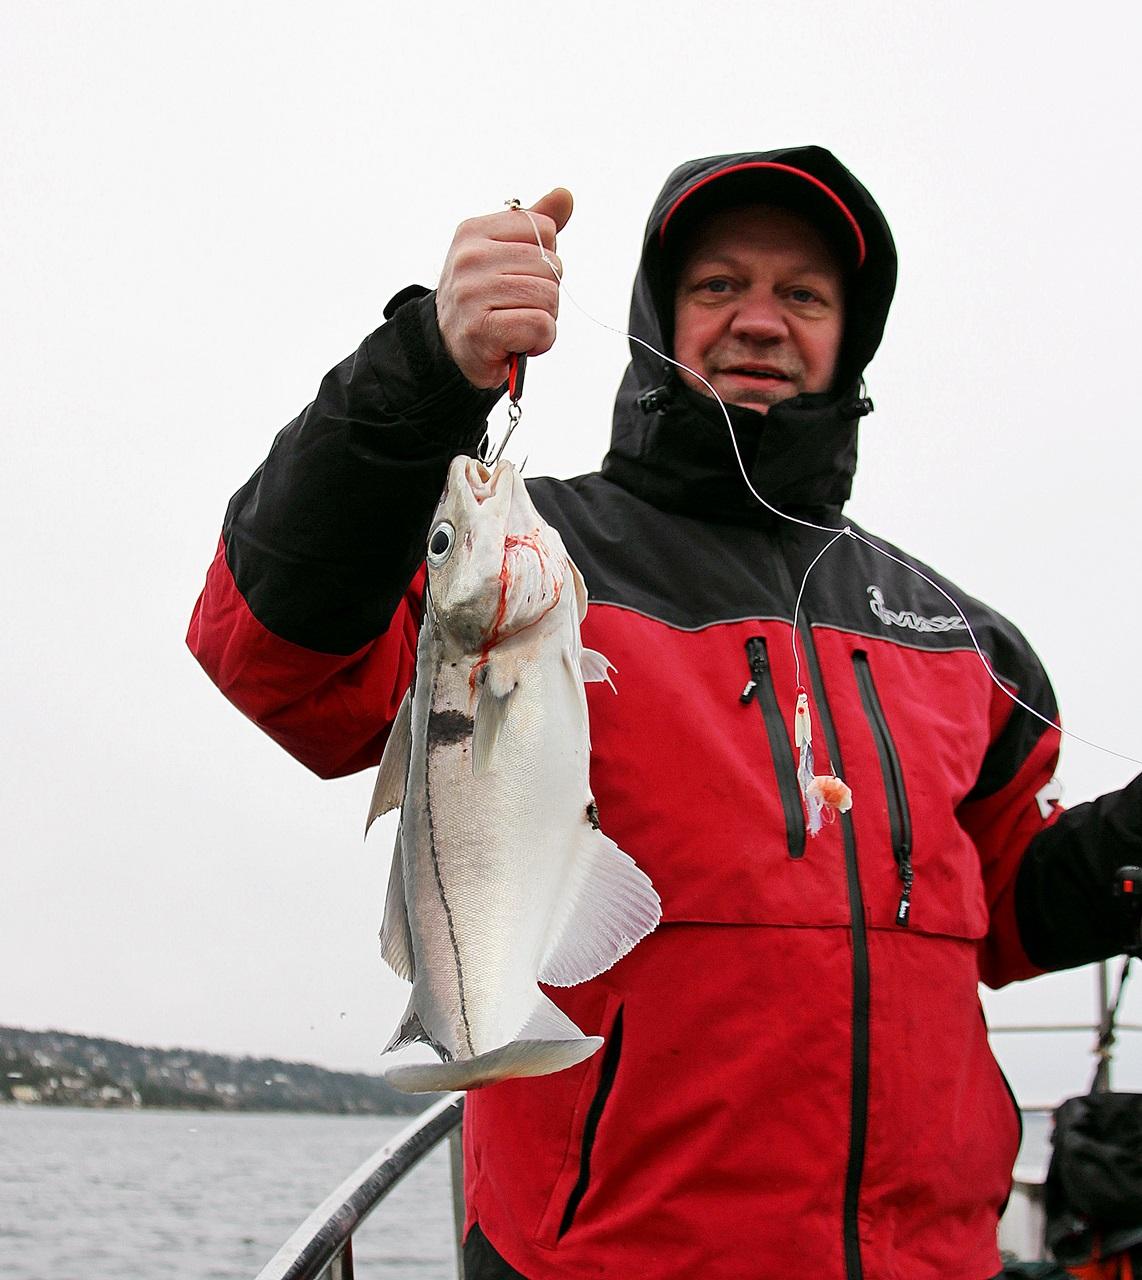 Båtfiske gav mange arter, her en hyse/kolje